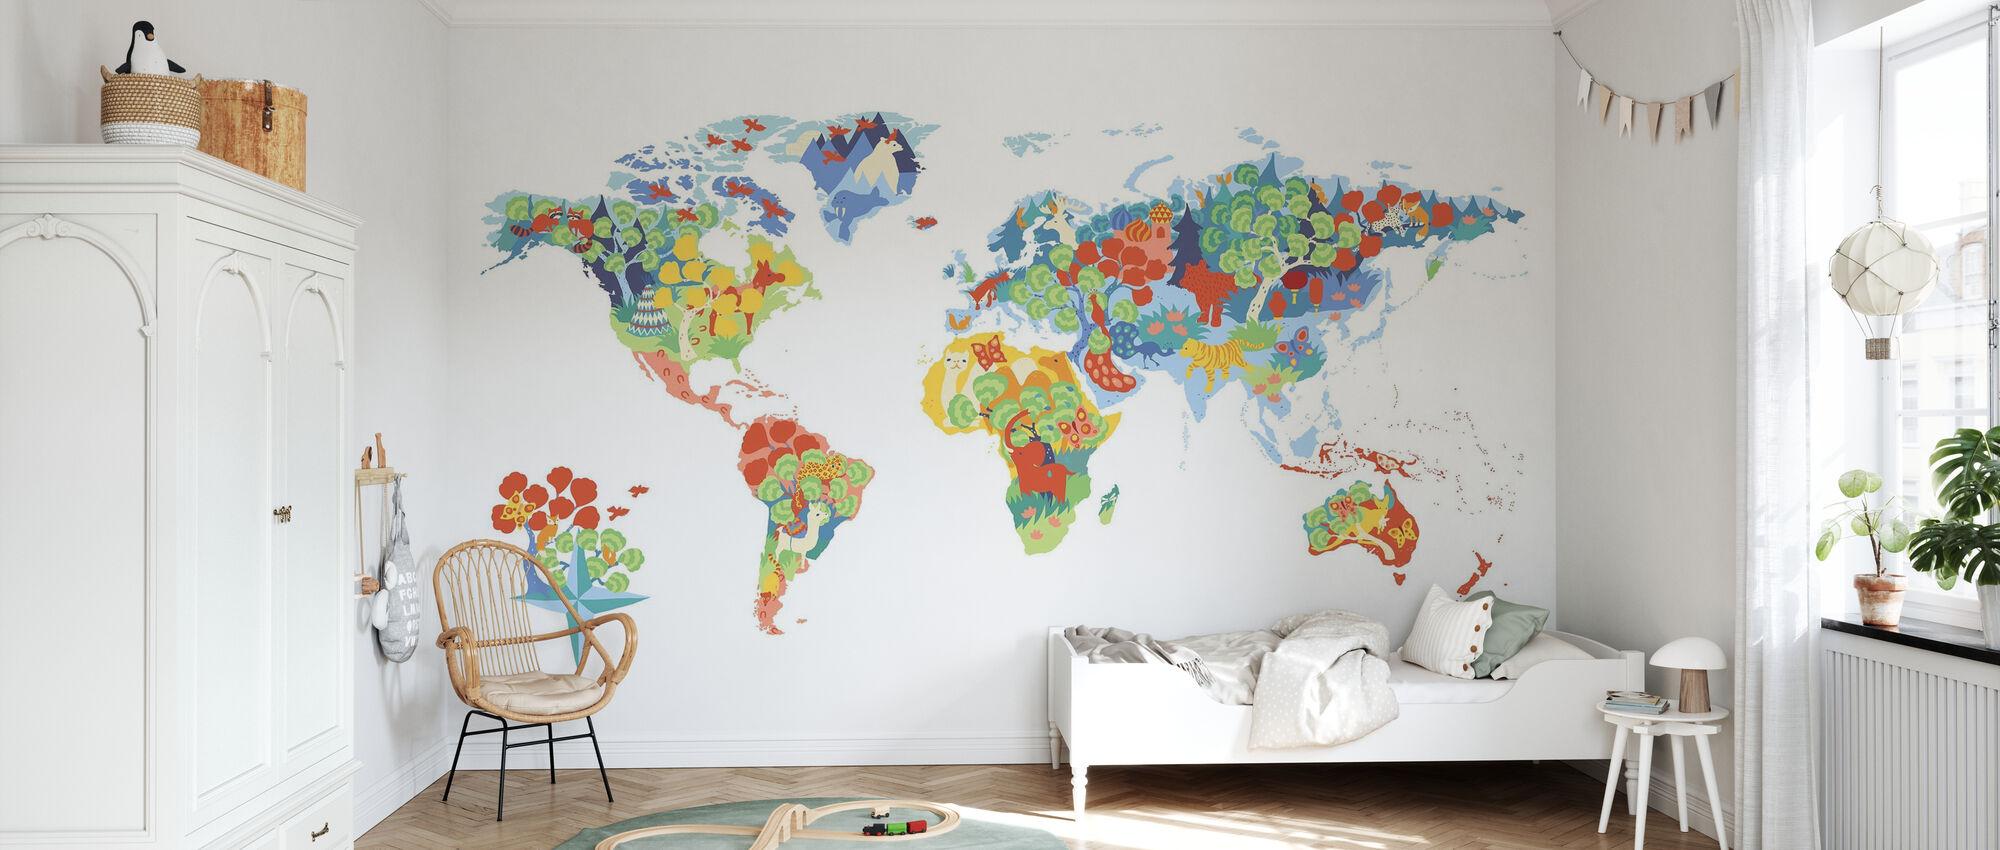 Wonderful World - Wallpaper - Kids Room